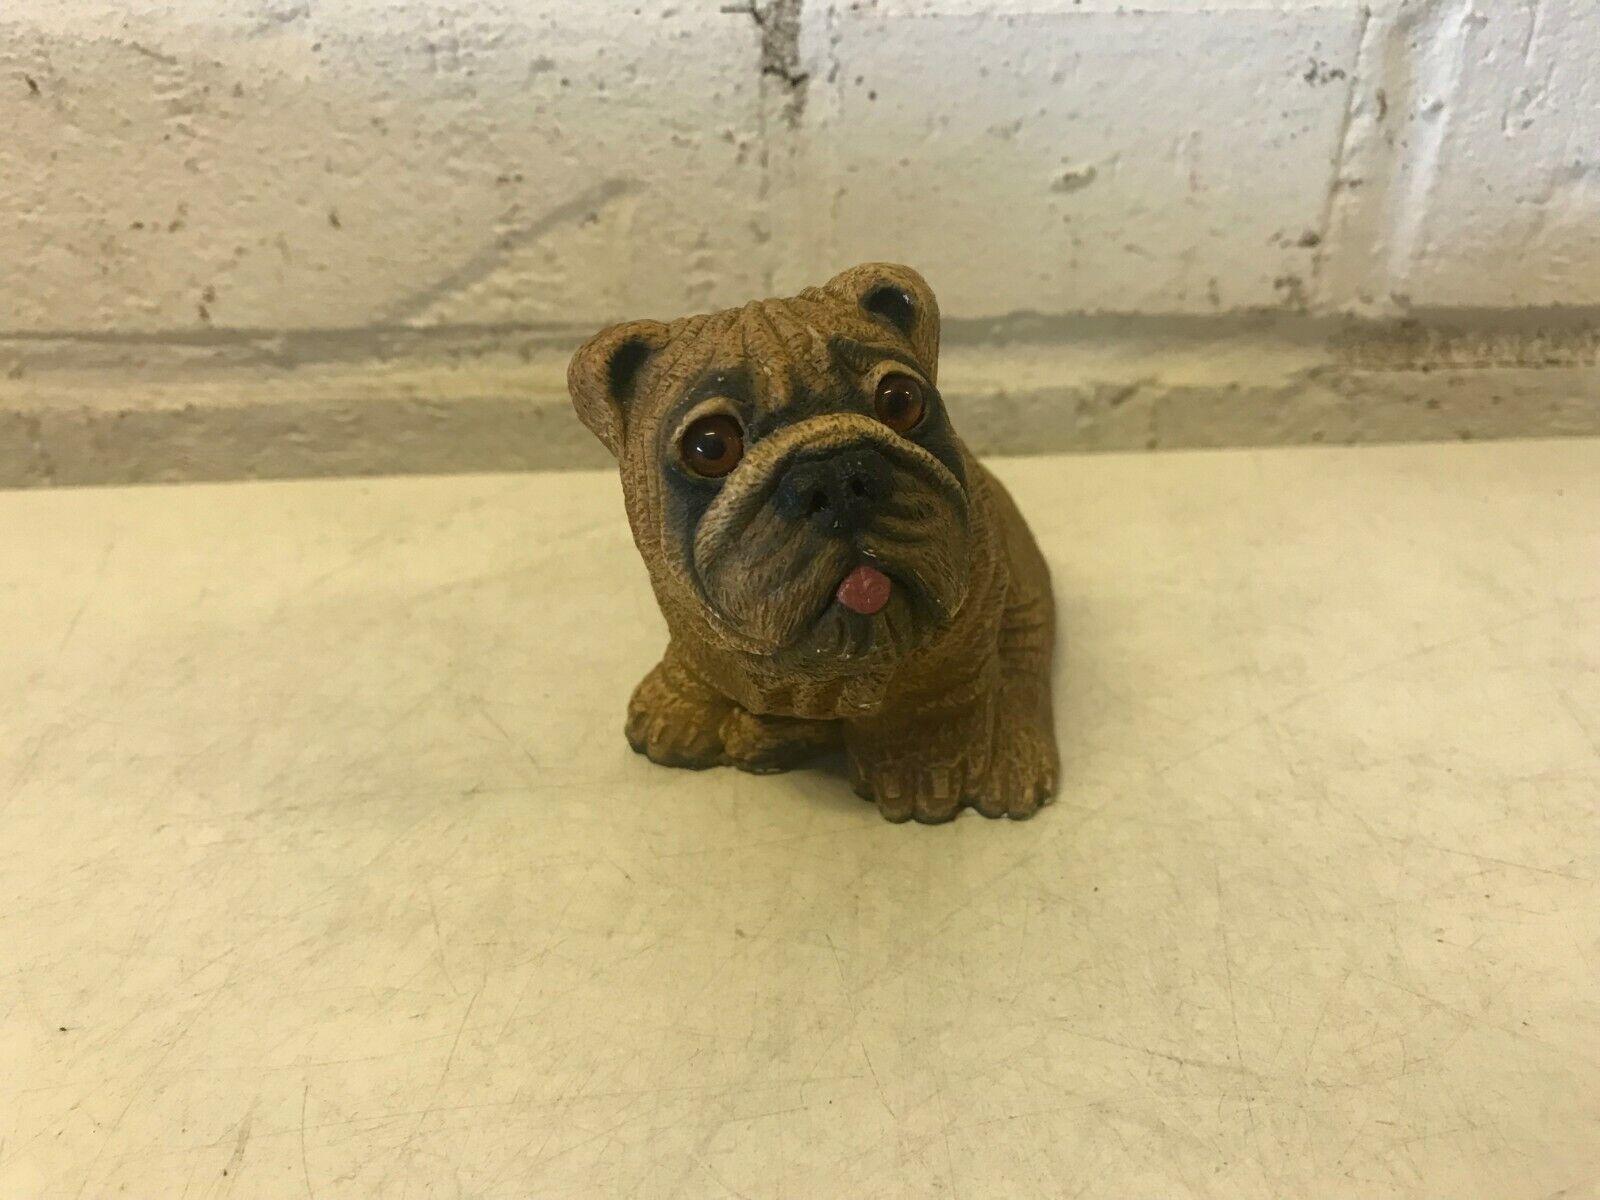 Vintage bandana bulldog anglais figurine assis 1984 signé